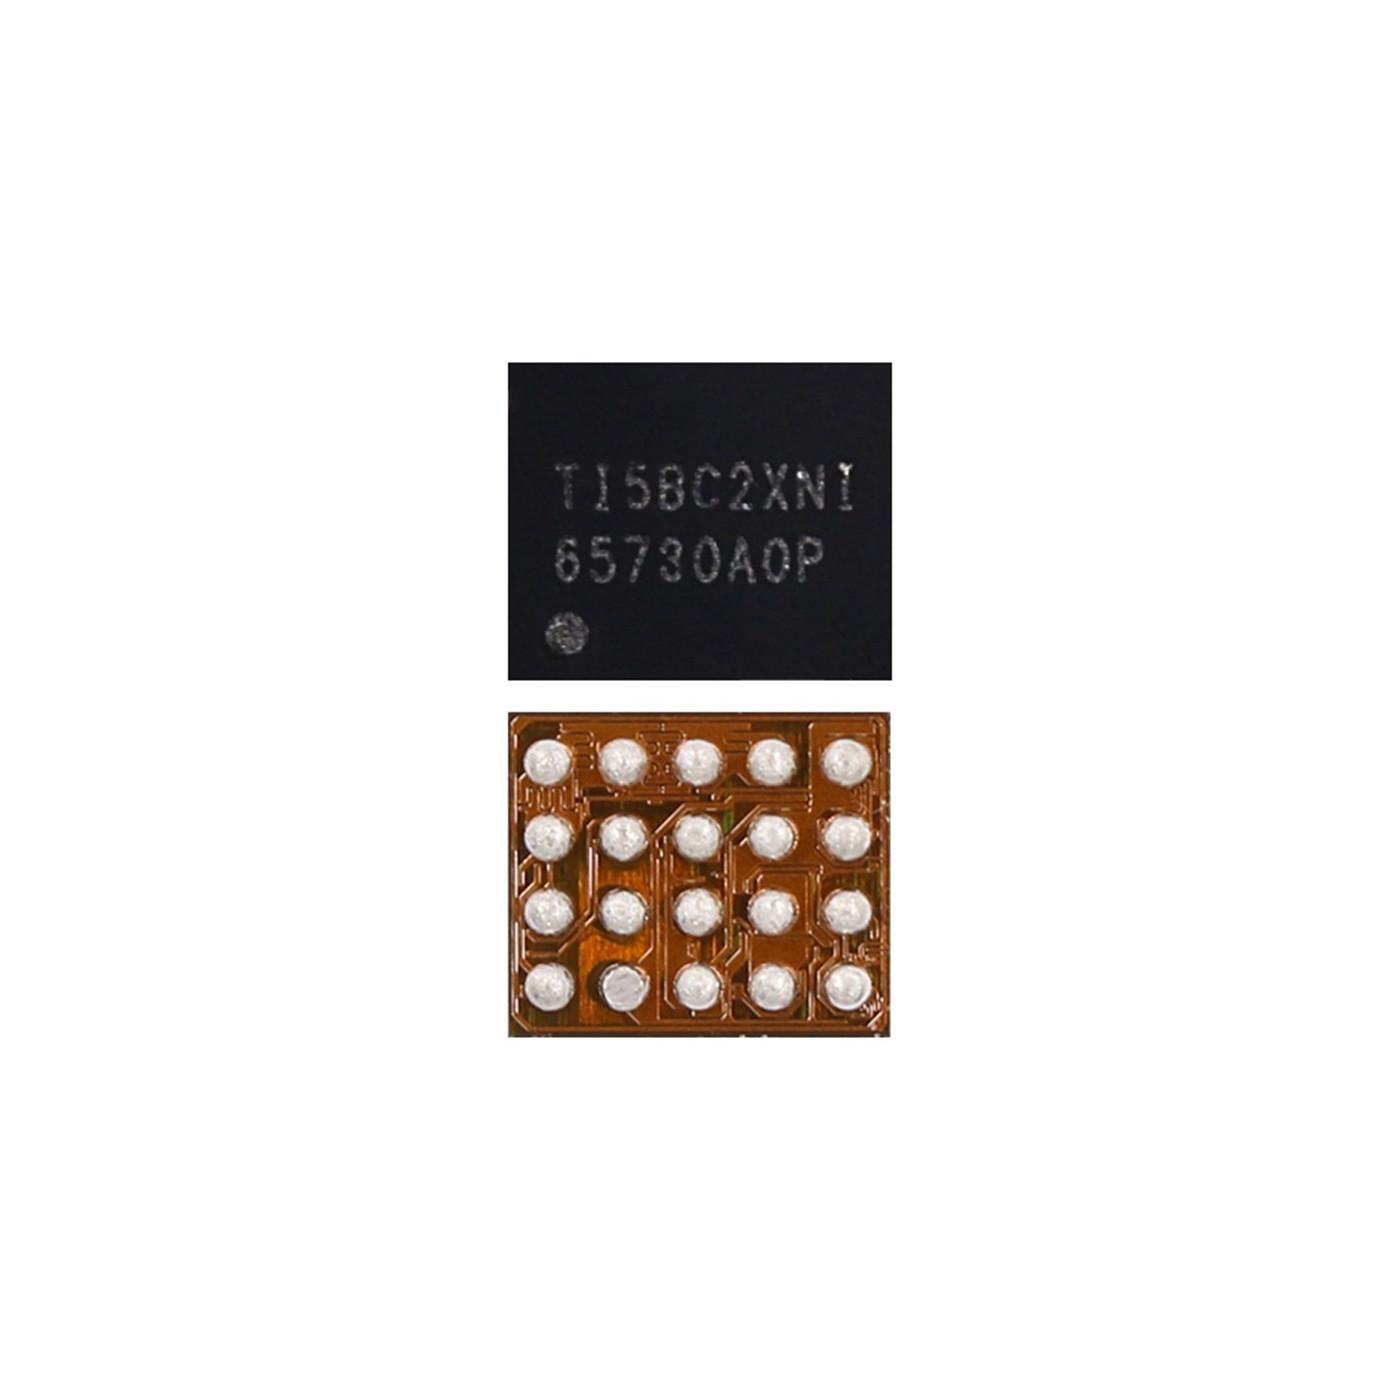 IC CHIP 65730 LCD 20 Pin Dispaly para iPhone 6/6 Plus / 6S / 6S Plus / 7